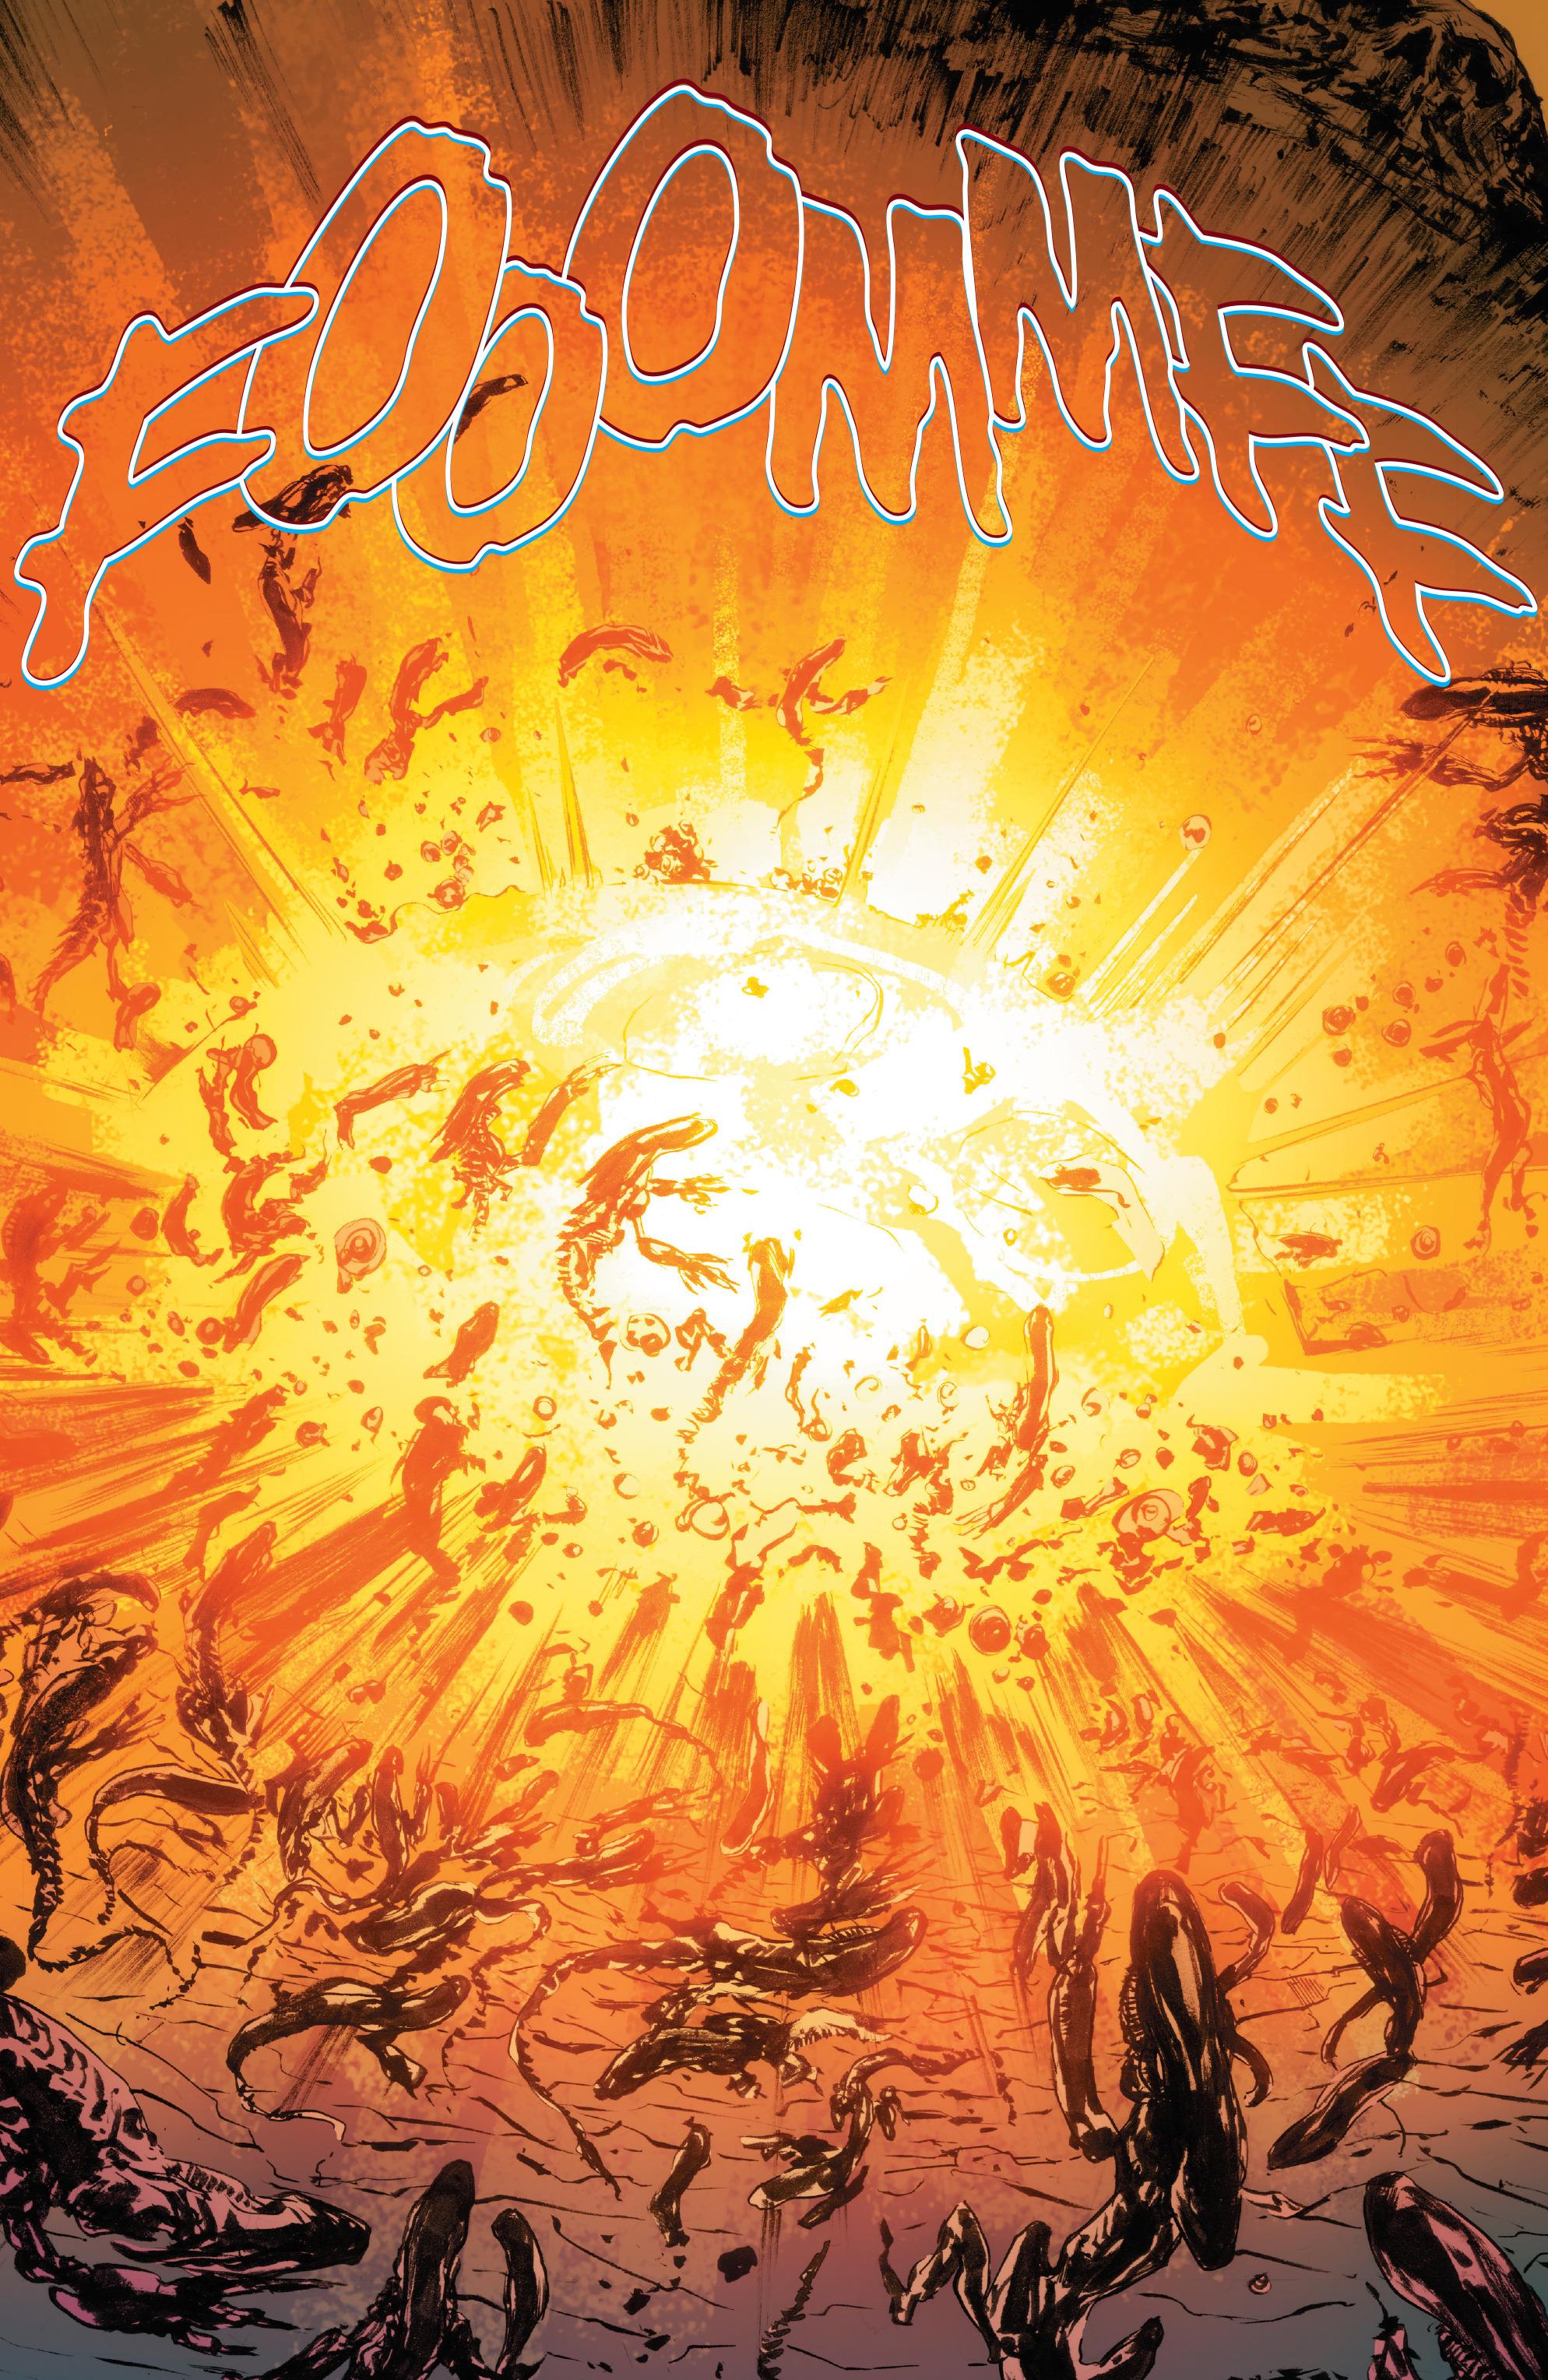 Read online Alien Vs. Predator: Life and Death comic -  Issue #4 - 13